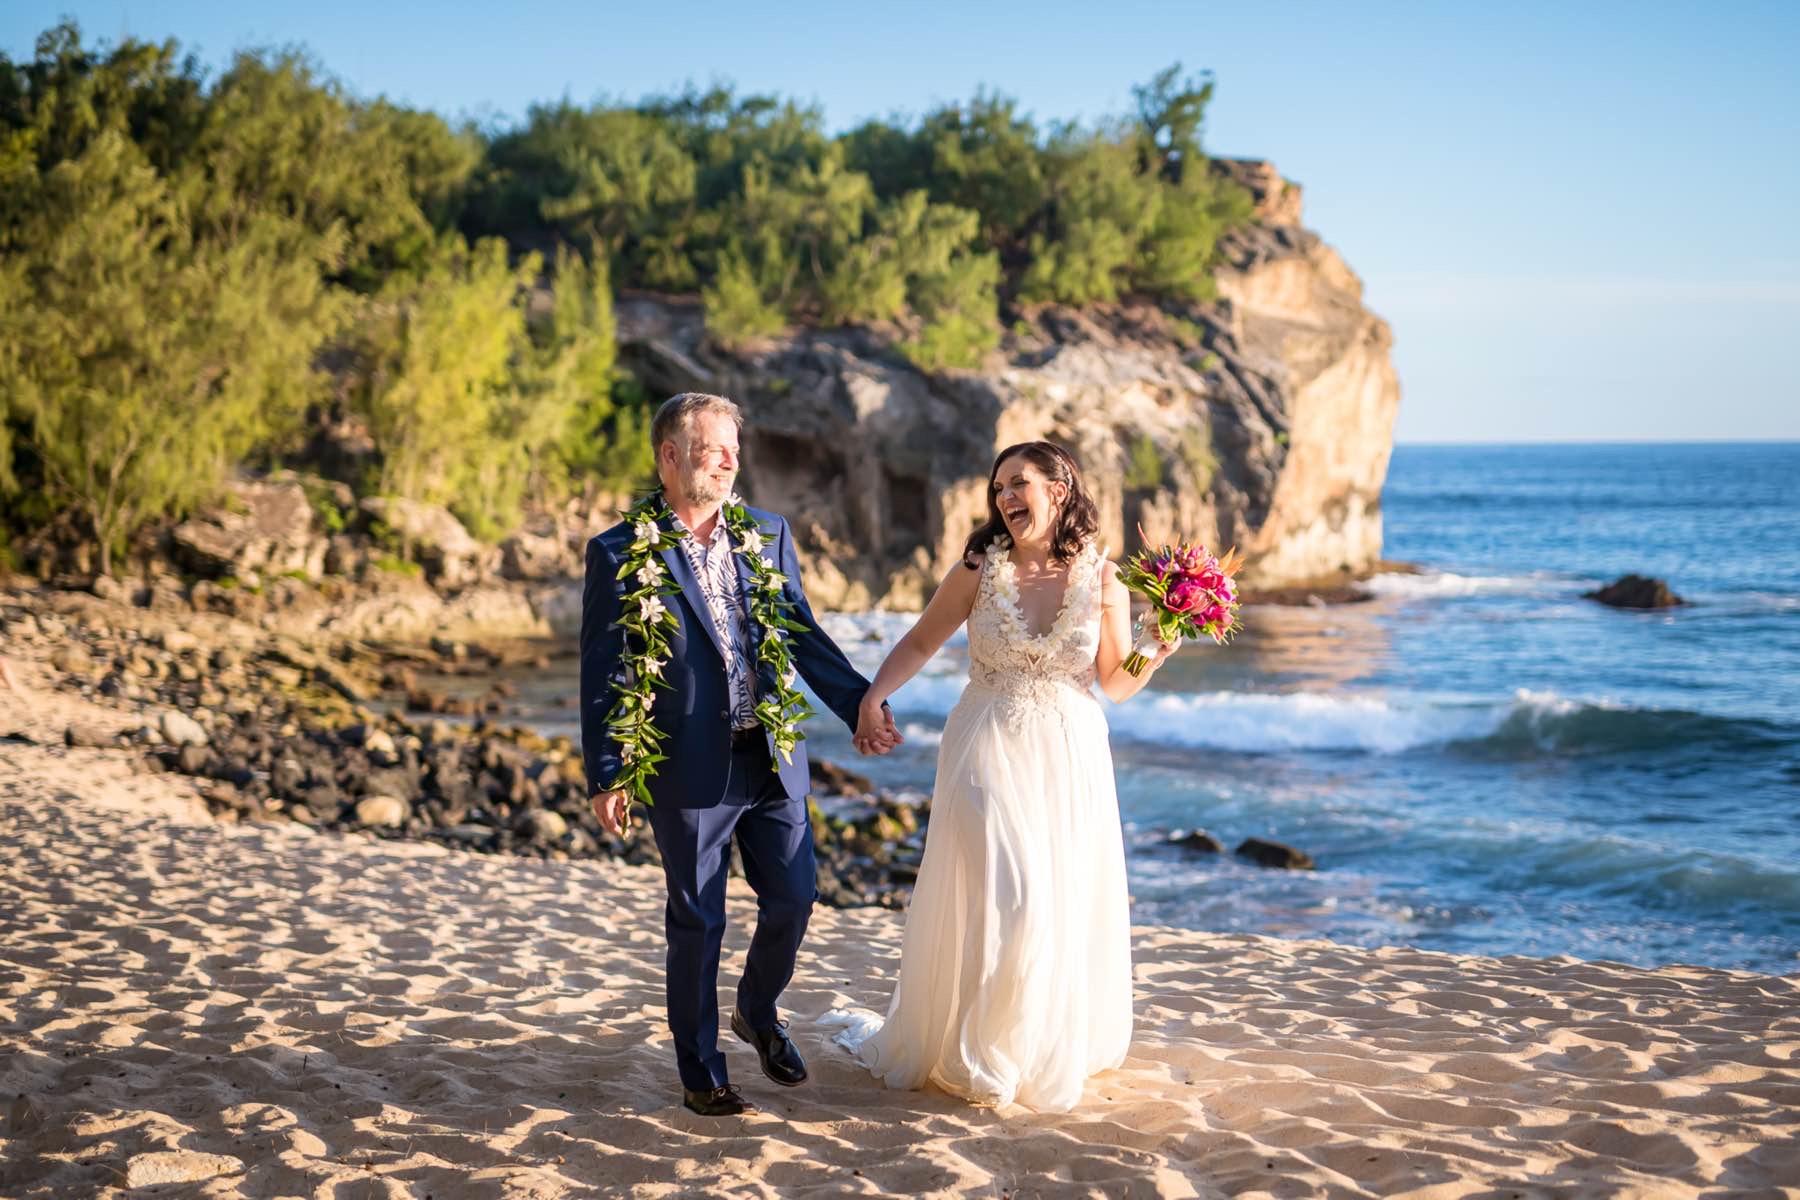 Corina & Kipp walking on the beach in Kauai.